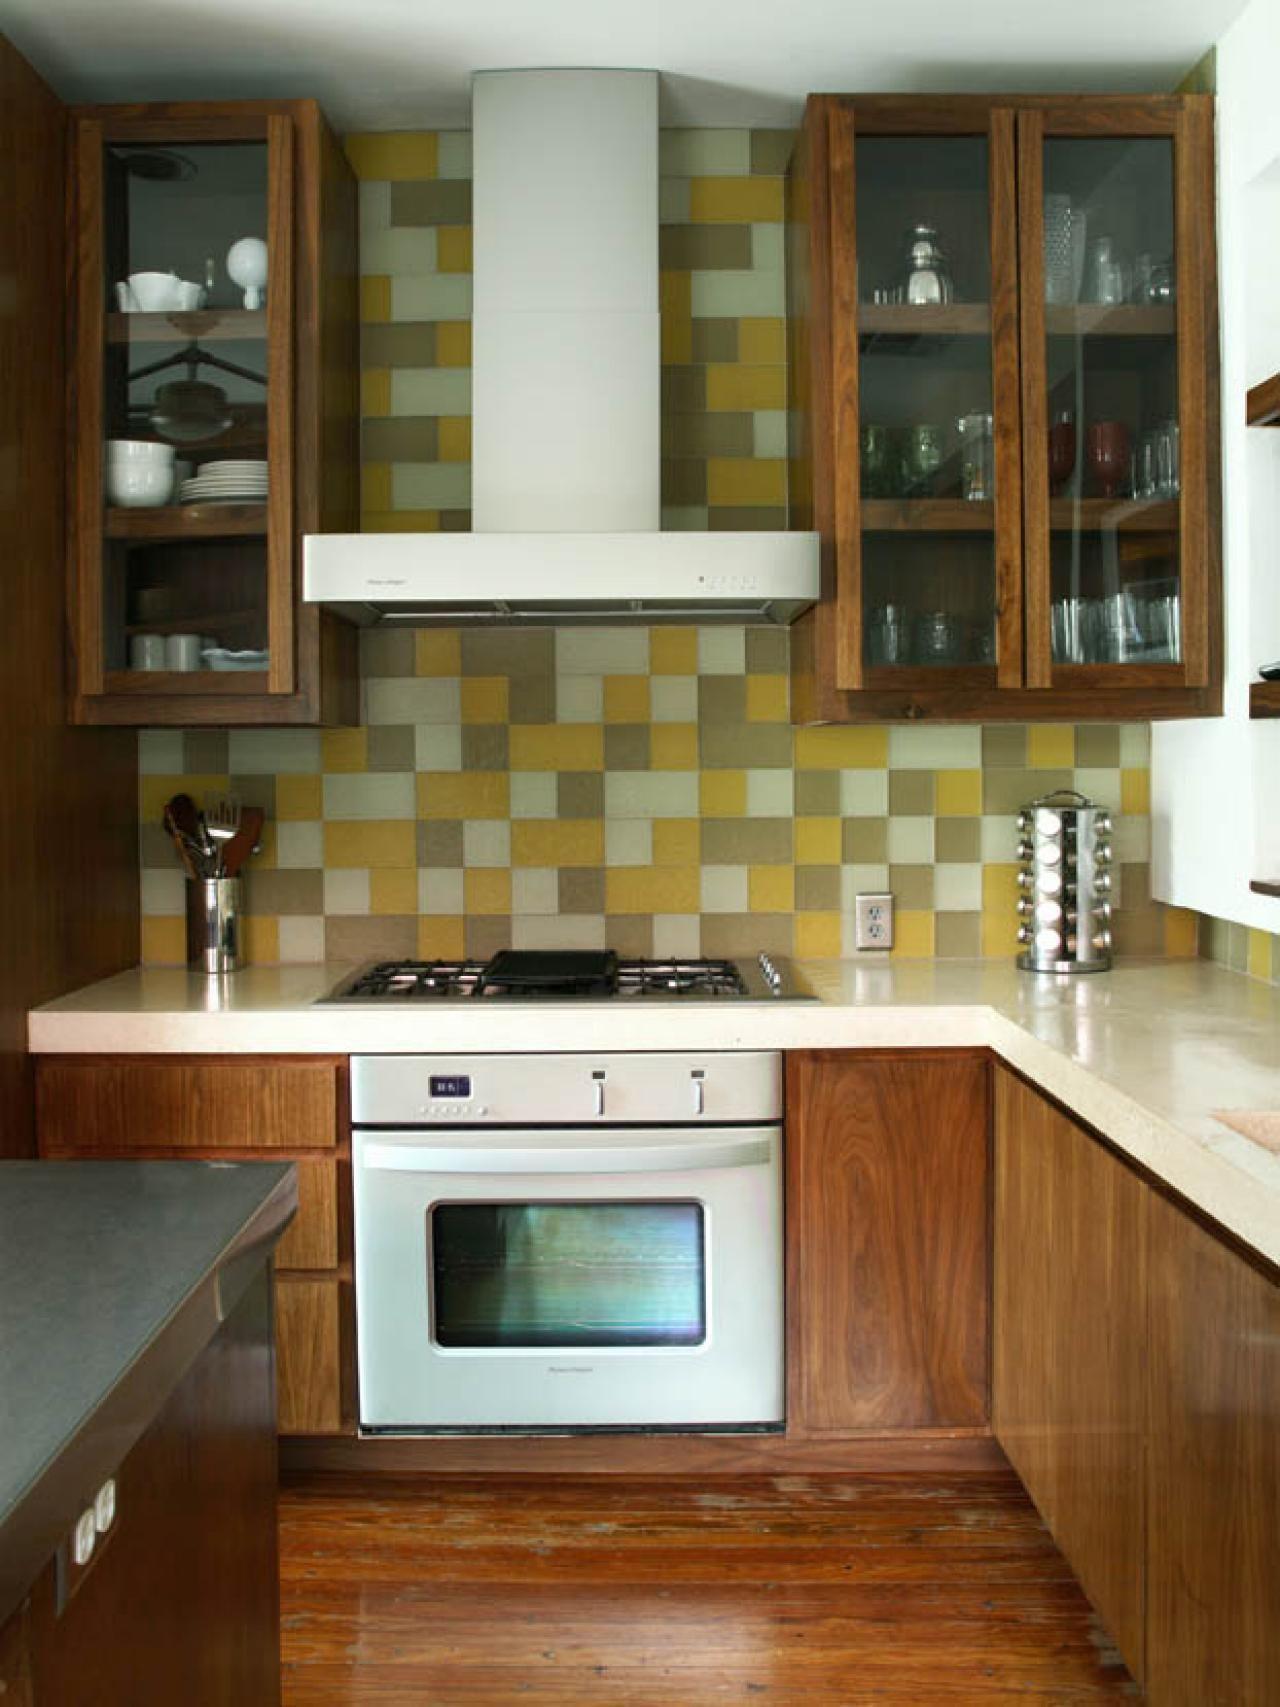 glass tile backsplash ideas pictures tips from outdoor kitchen rh pinterest co uk